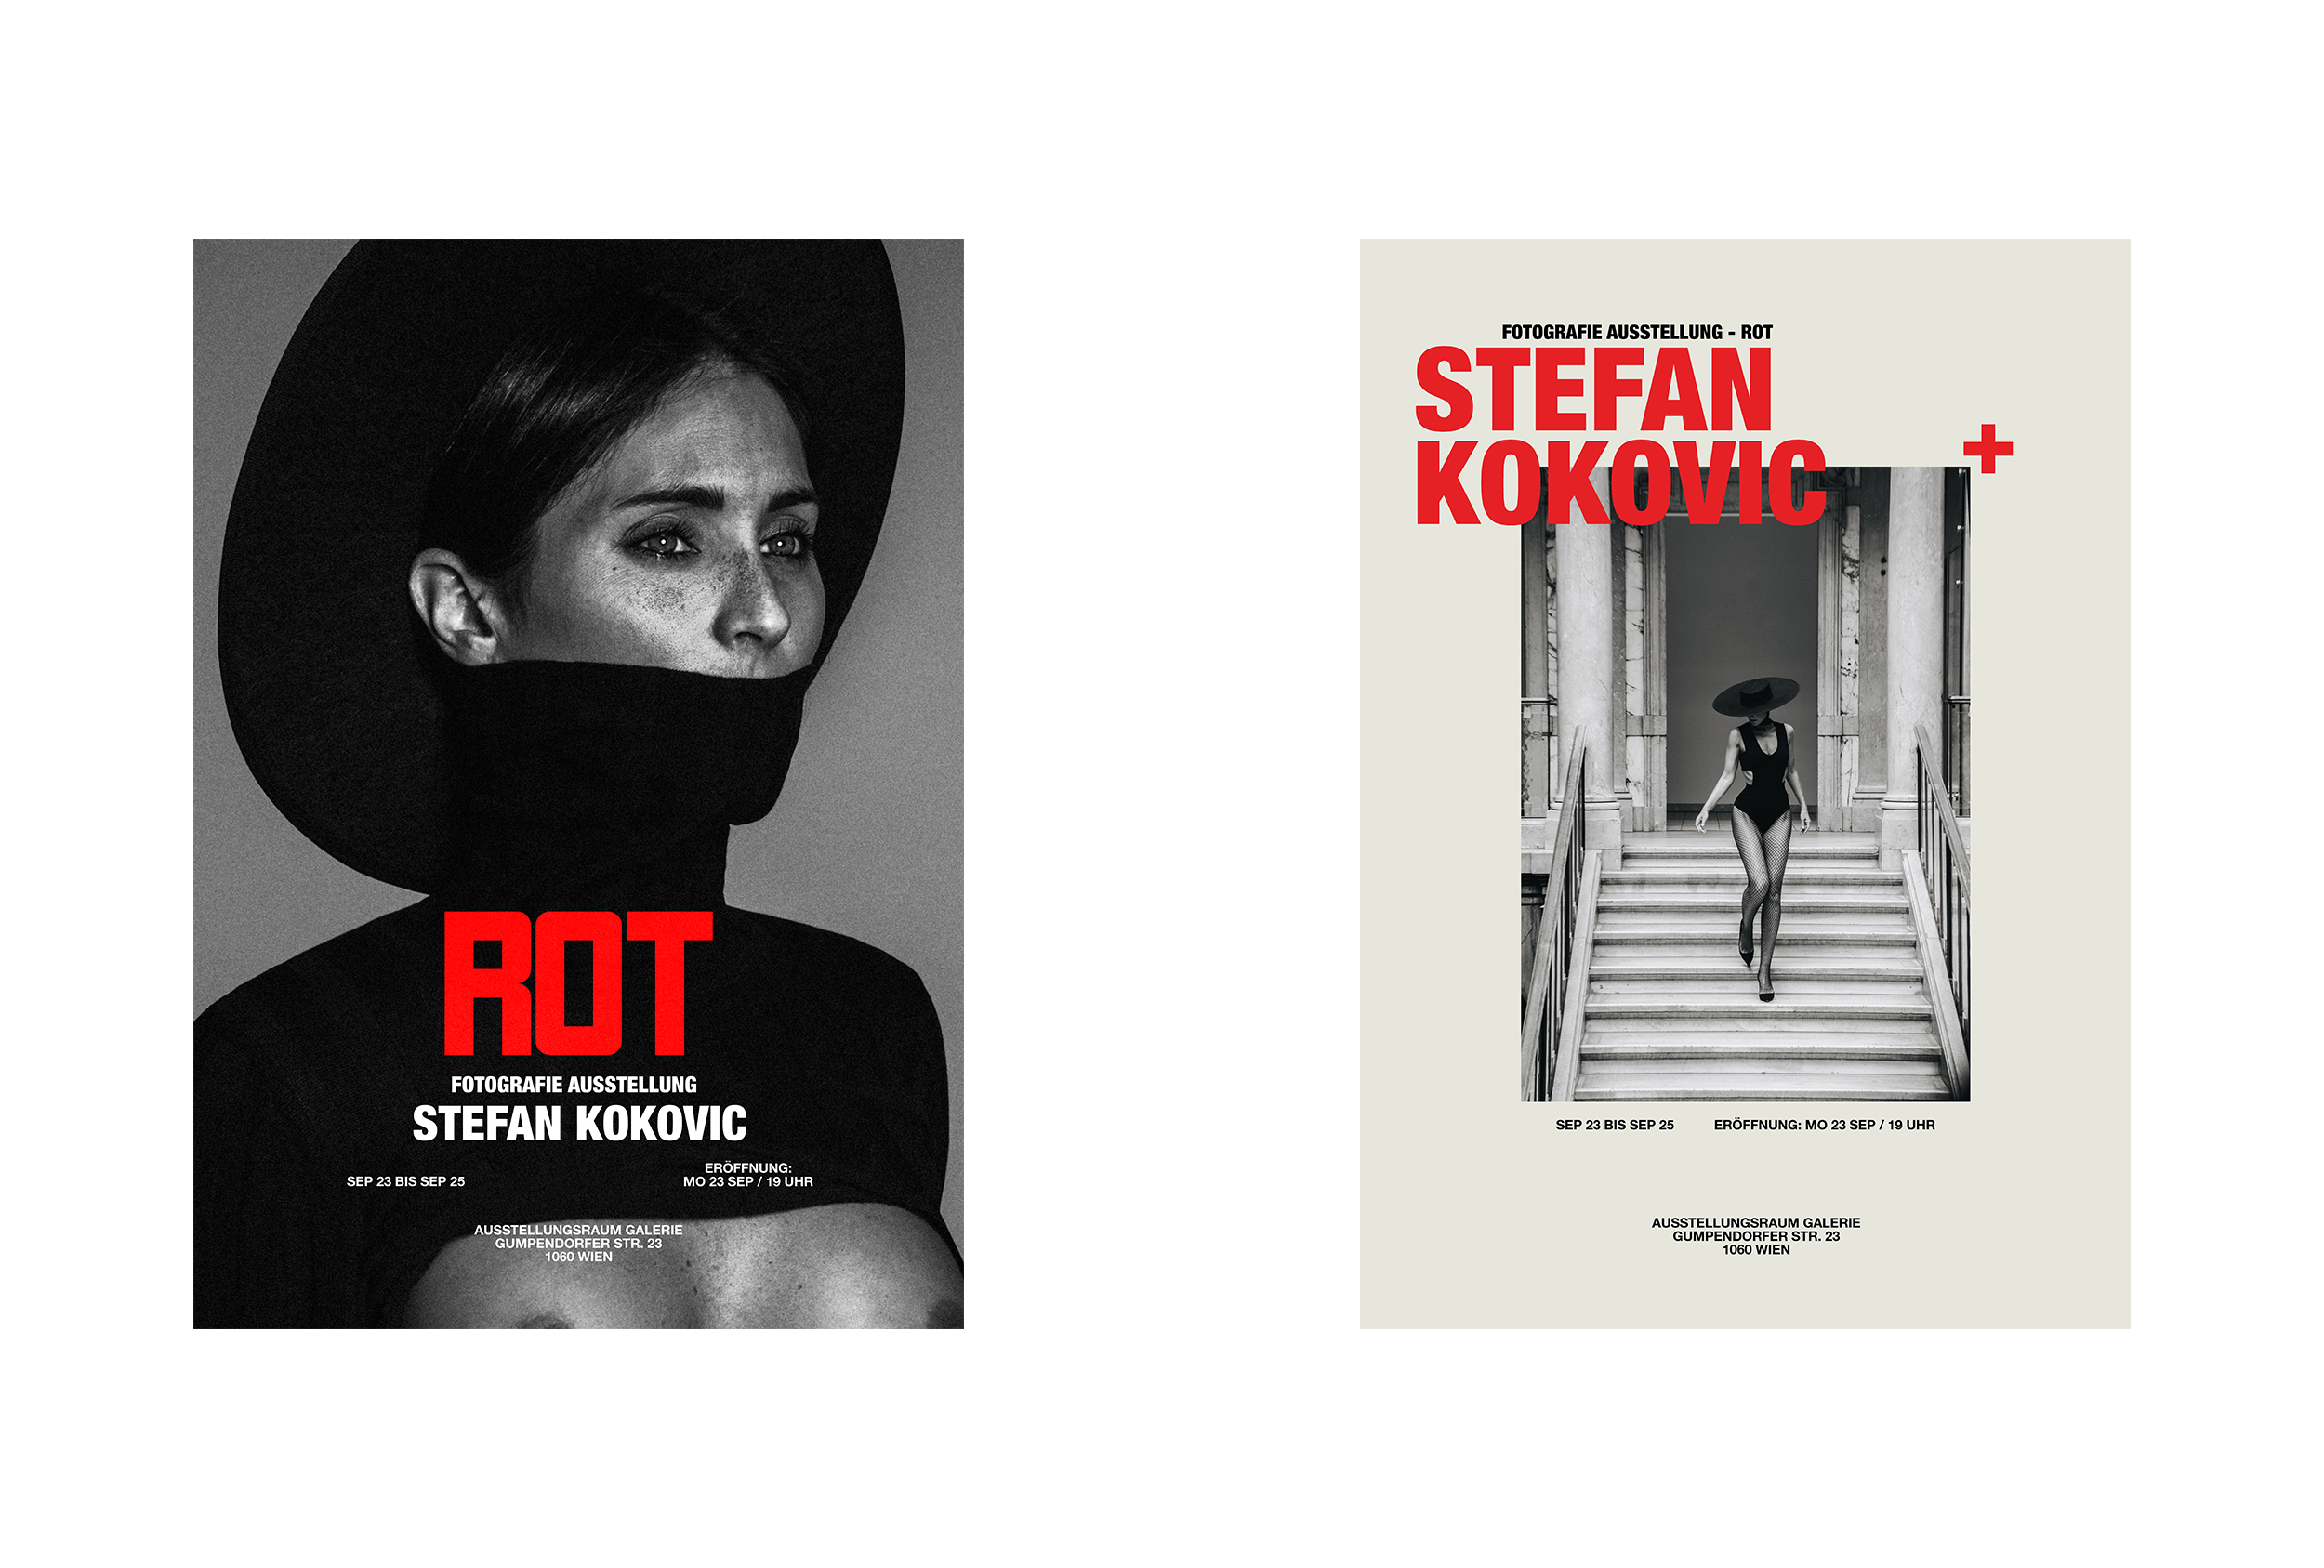 ROT Photography Exhibition Vienna stefan kokovic photographer